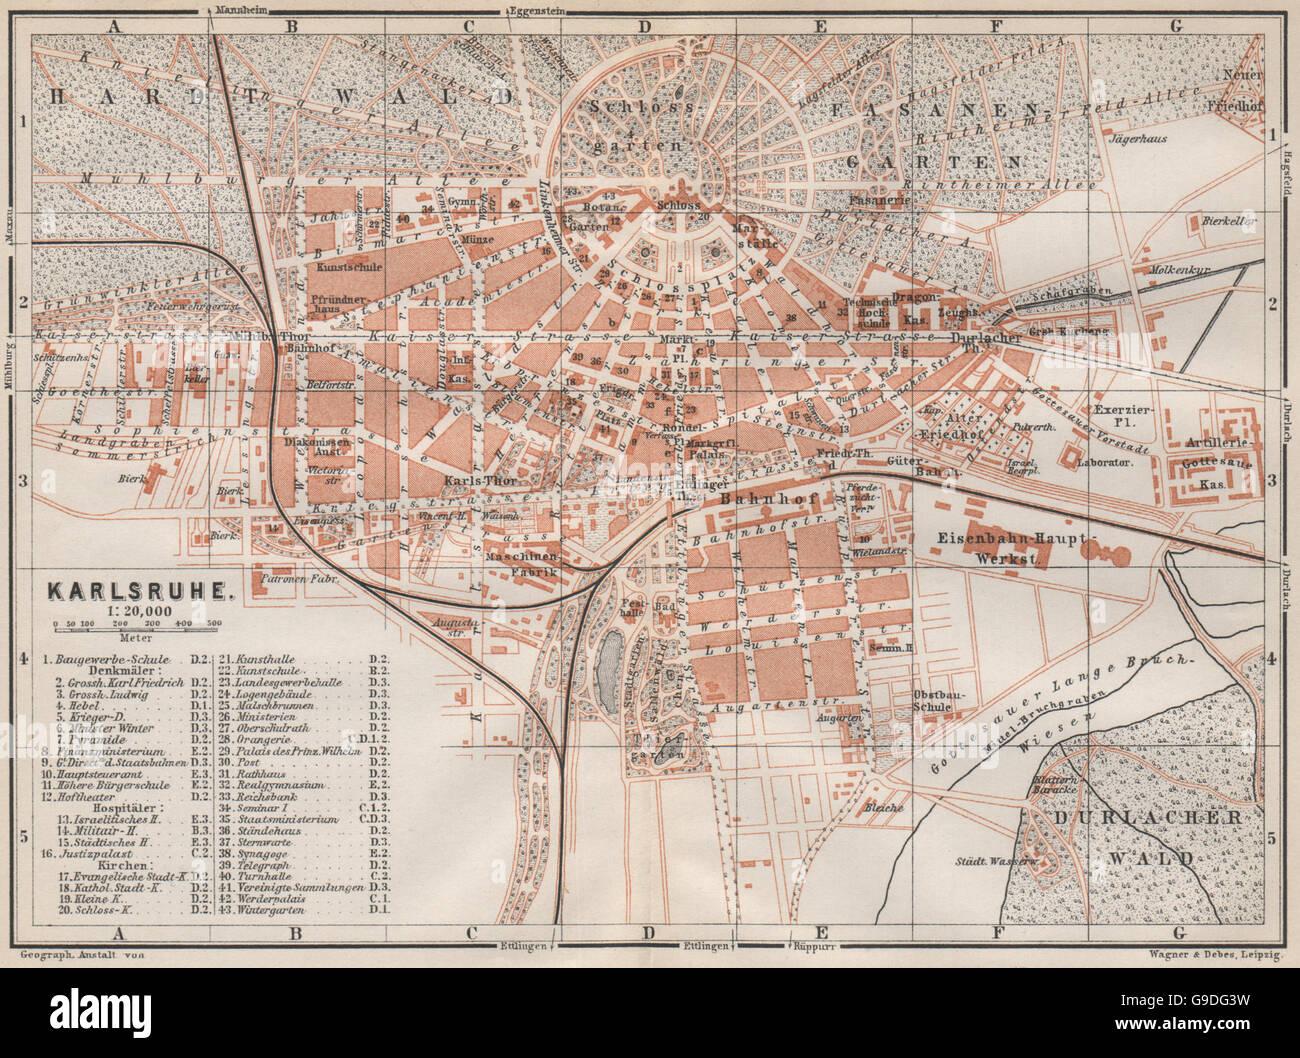 Karte Karlsruhe.Karlsruhe Antique Town City Stadtplan Baden Württemberg Karte 1889